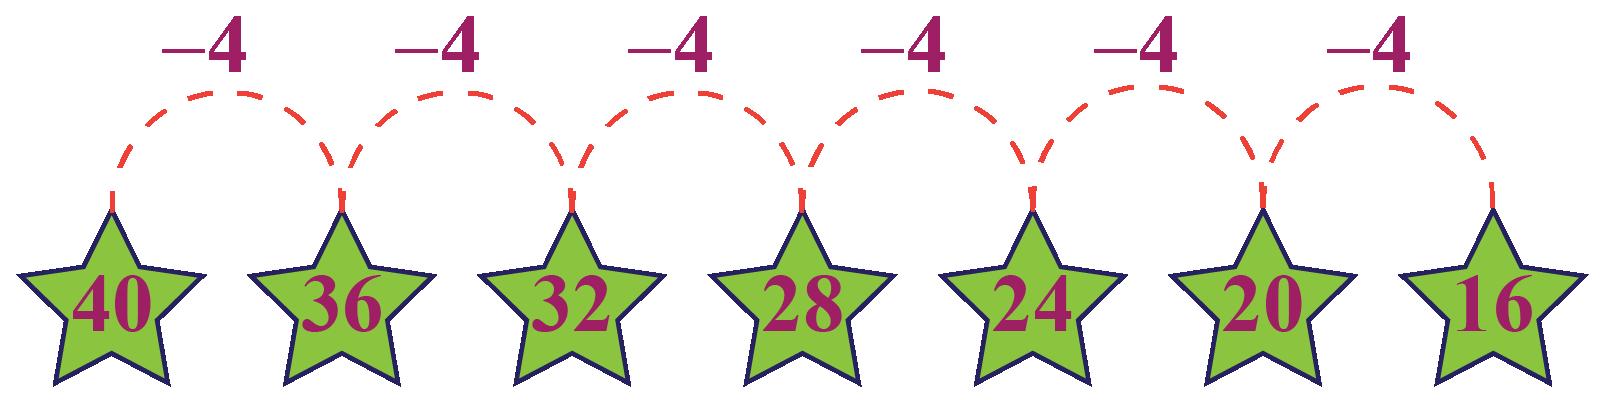 Sequence in descending order